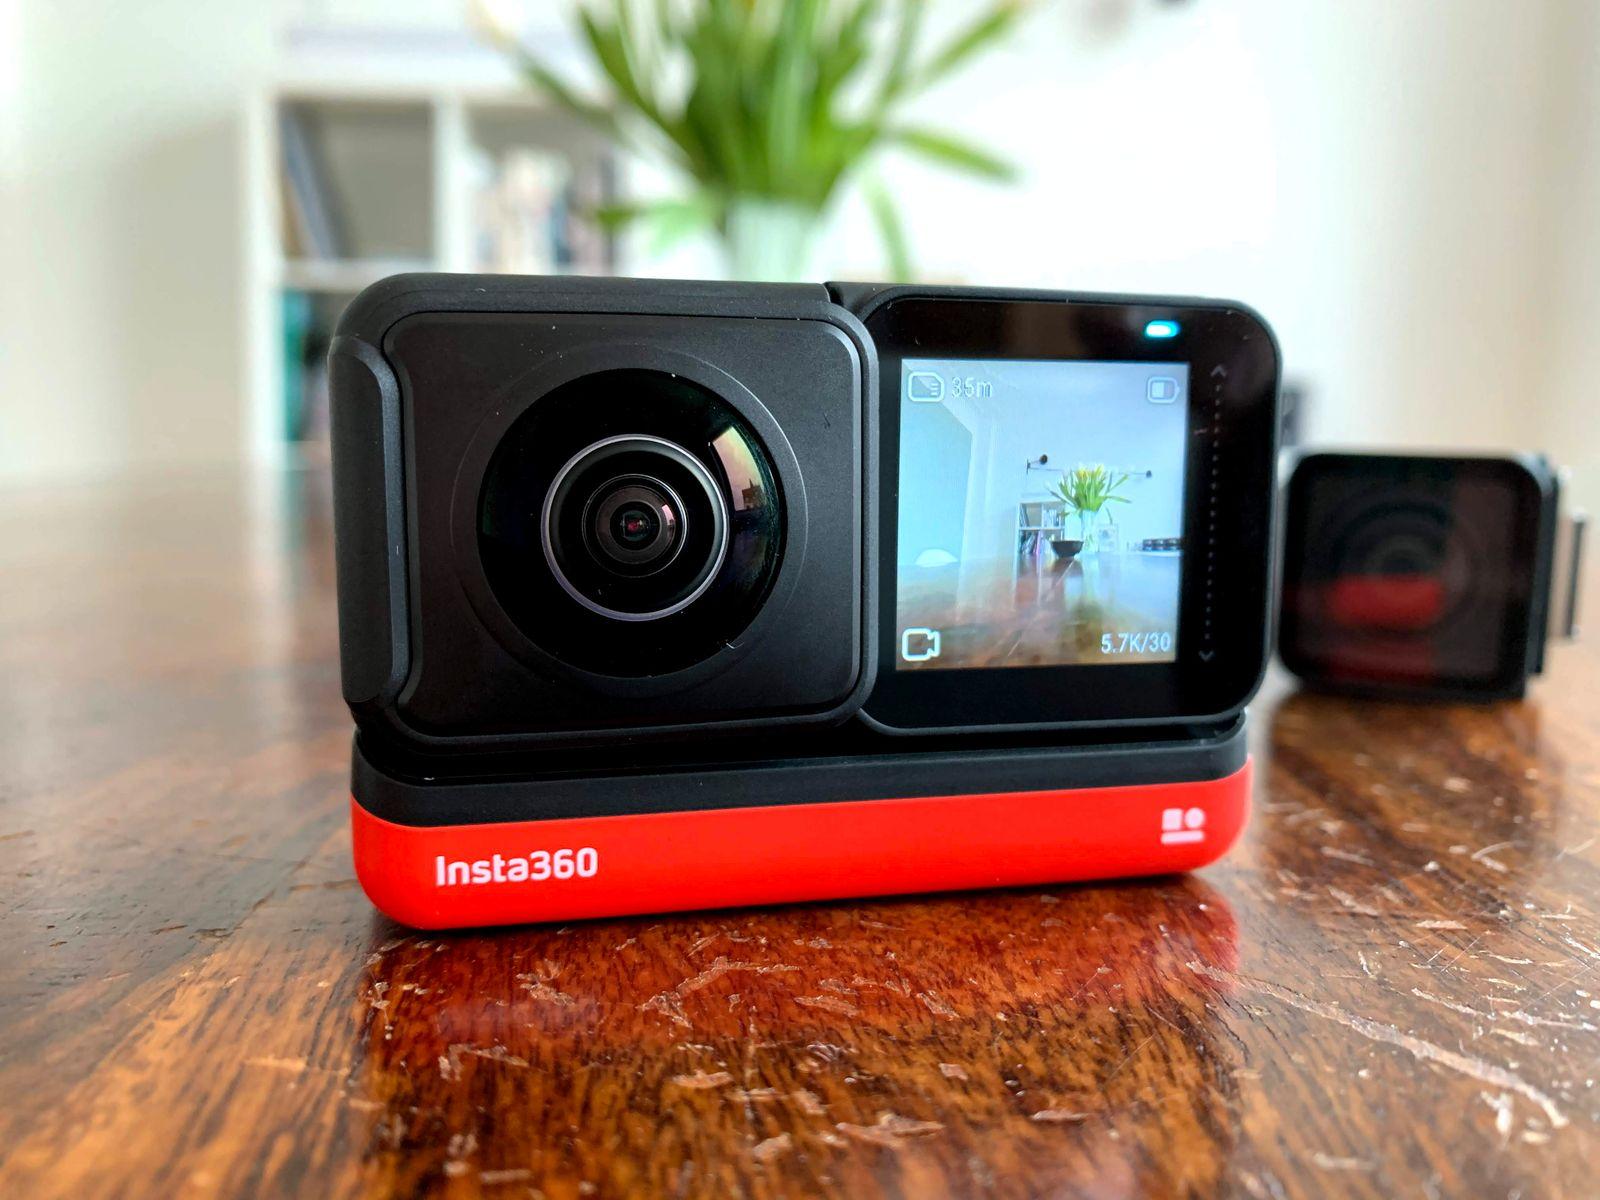 Kamera Insta360 One R im Test: